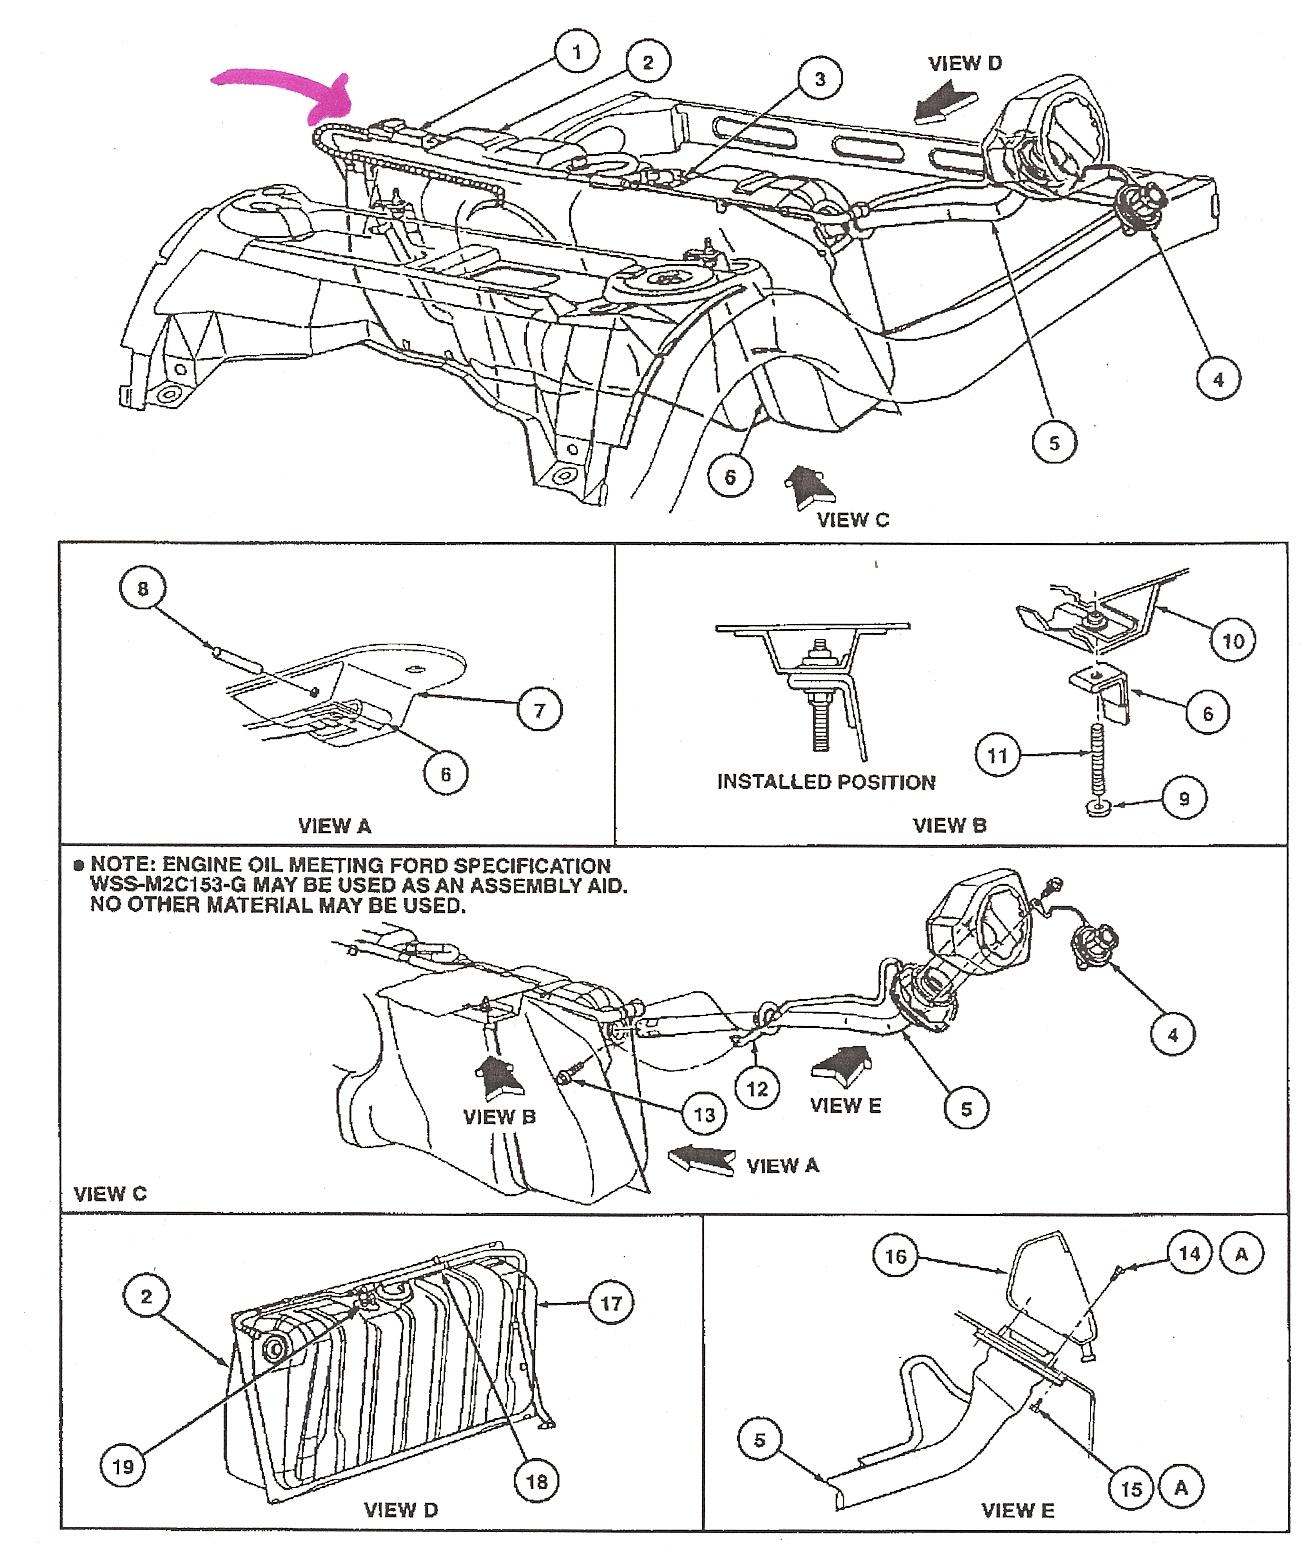 fuel tank pressure sensor questions 98 cv pi fordforumsonline com 2013 Ford Fusion Wiring-Diagram at nearapp.co